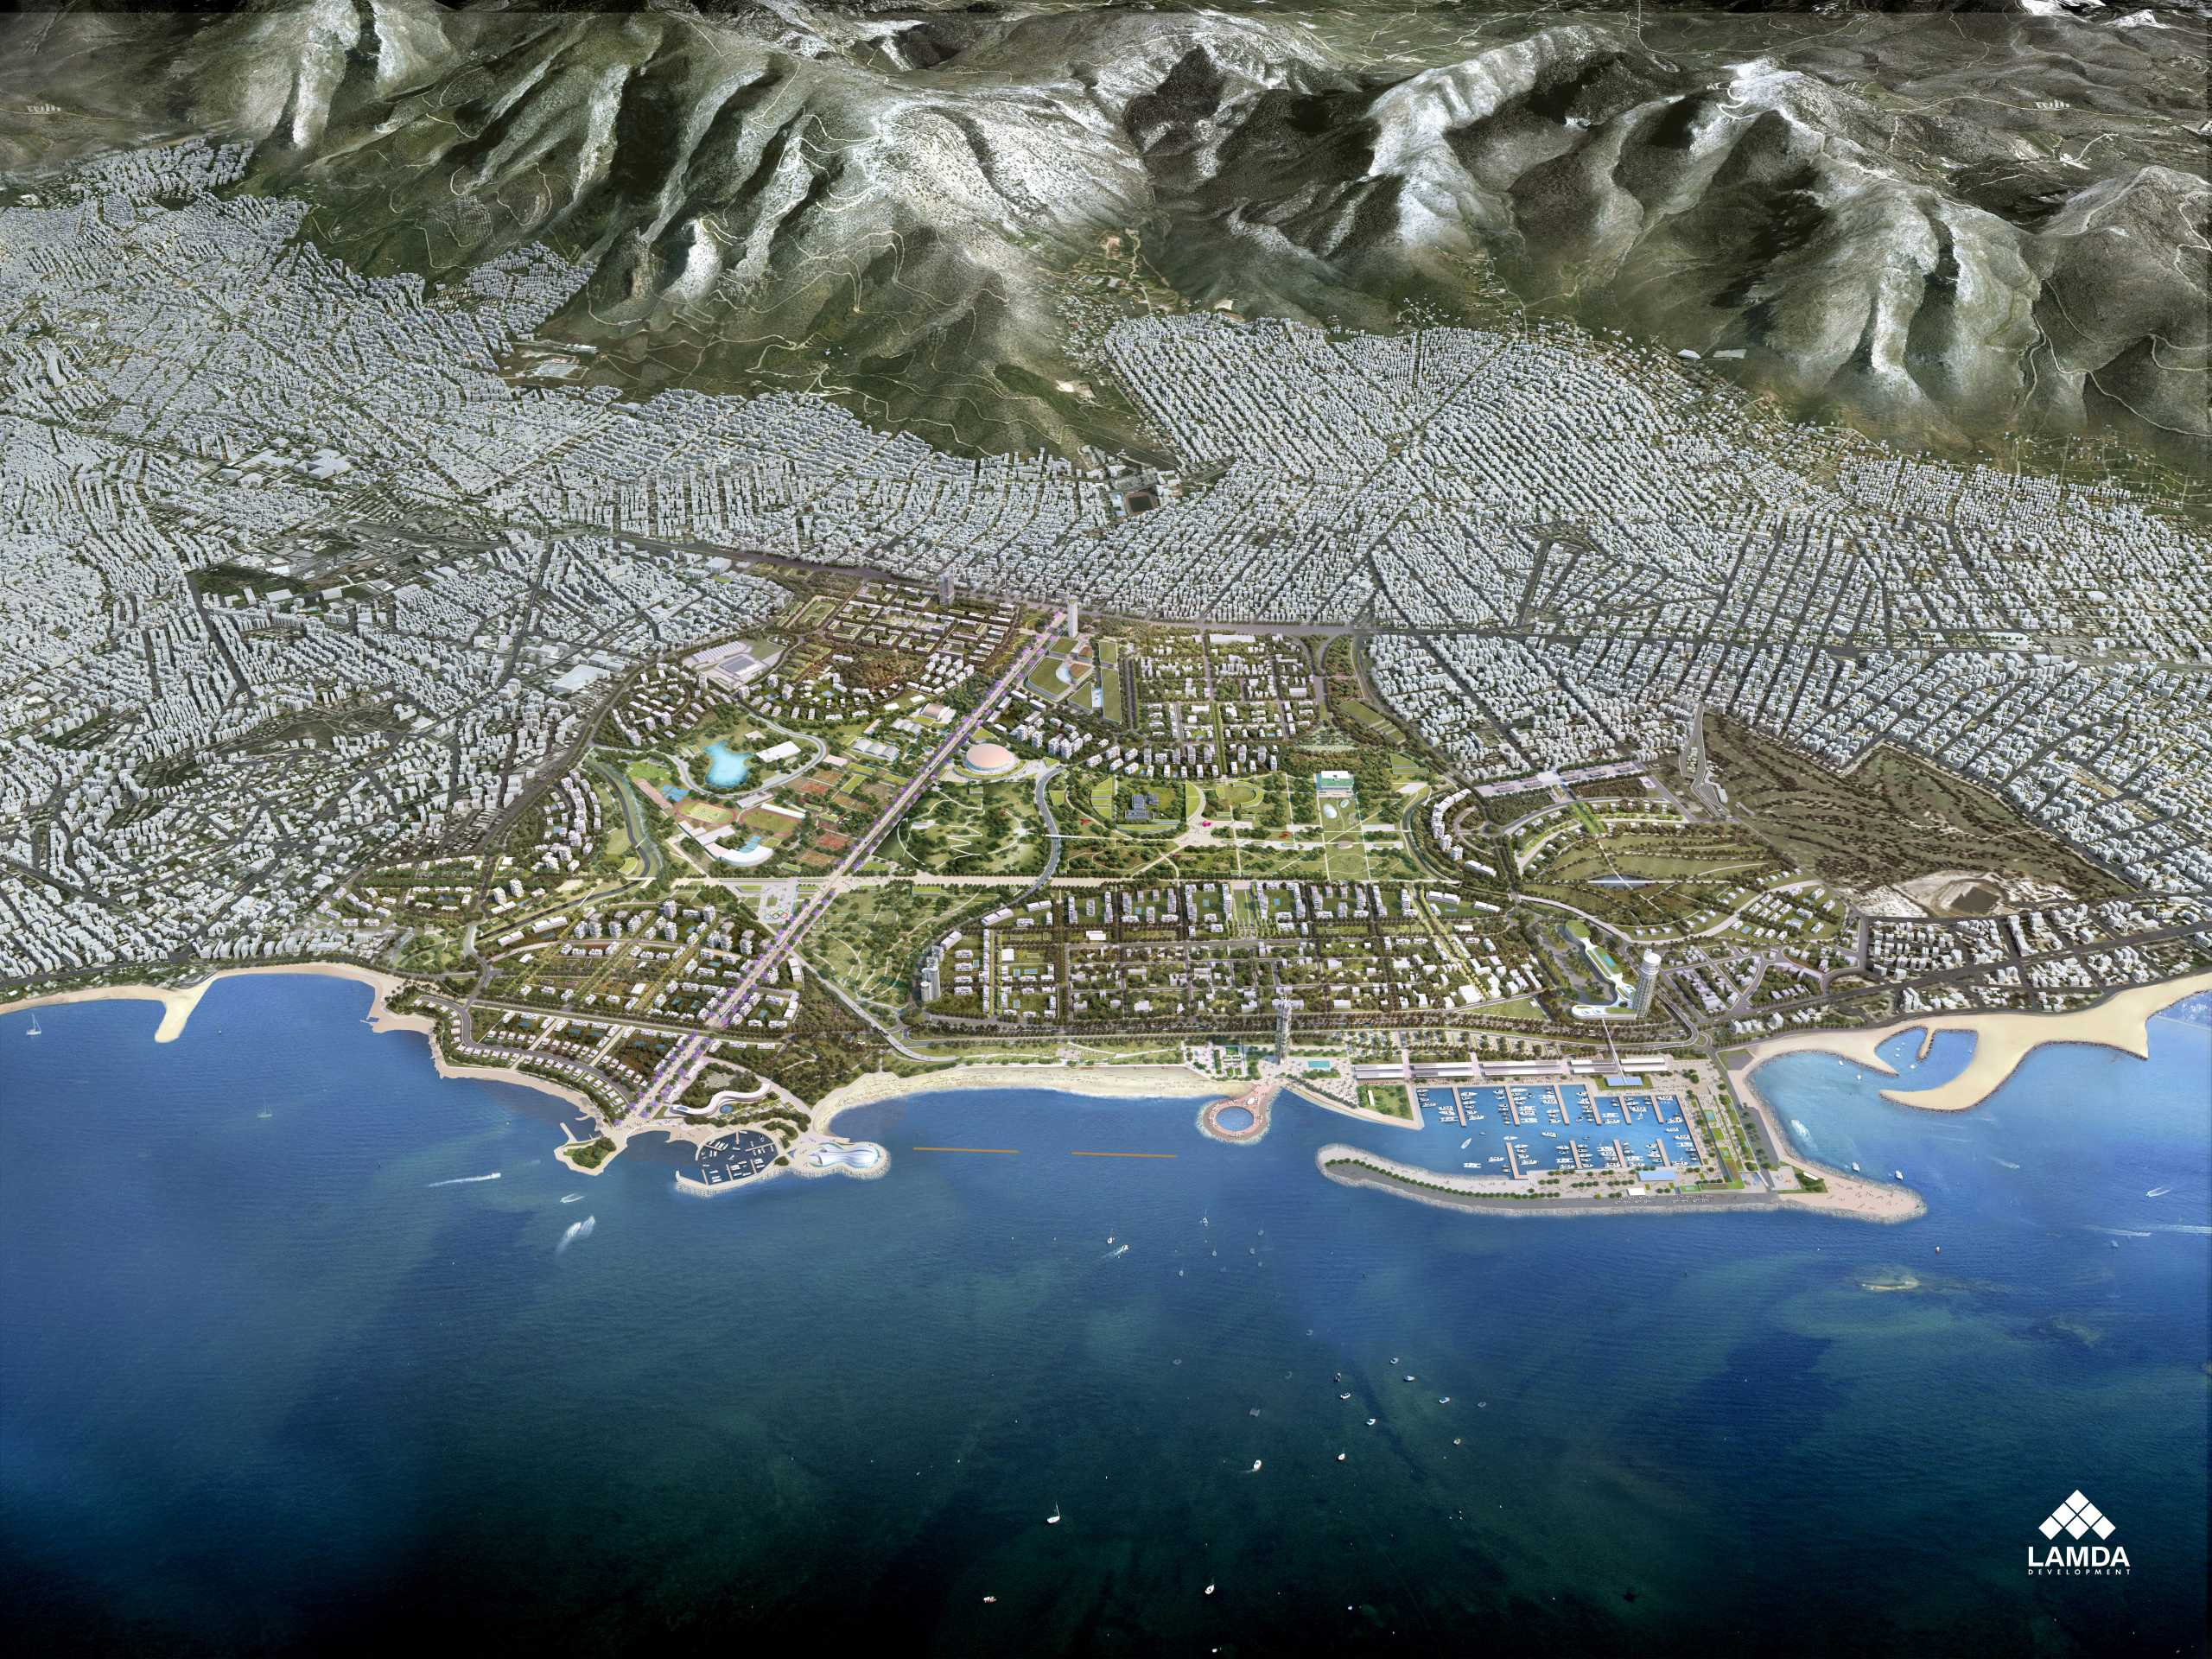 Lamda Development: Νέες συνεργασίες για το Ελληνικό προ των πυλών